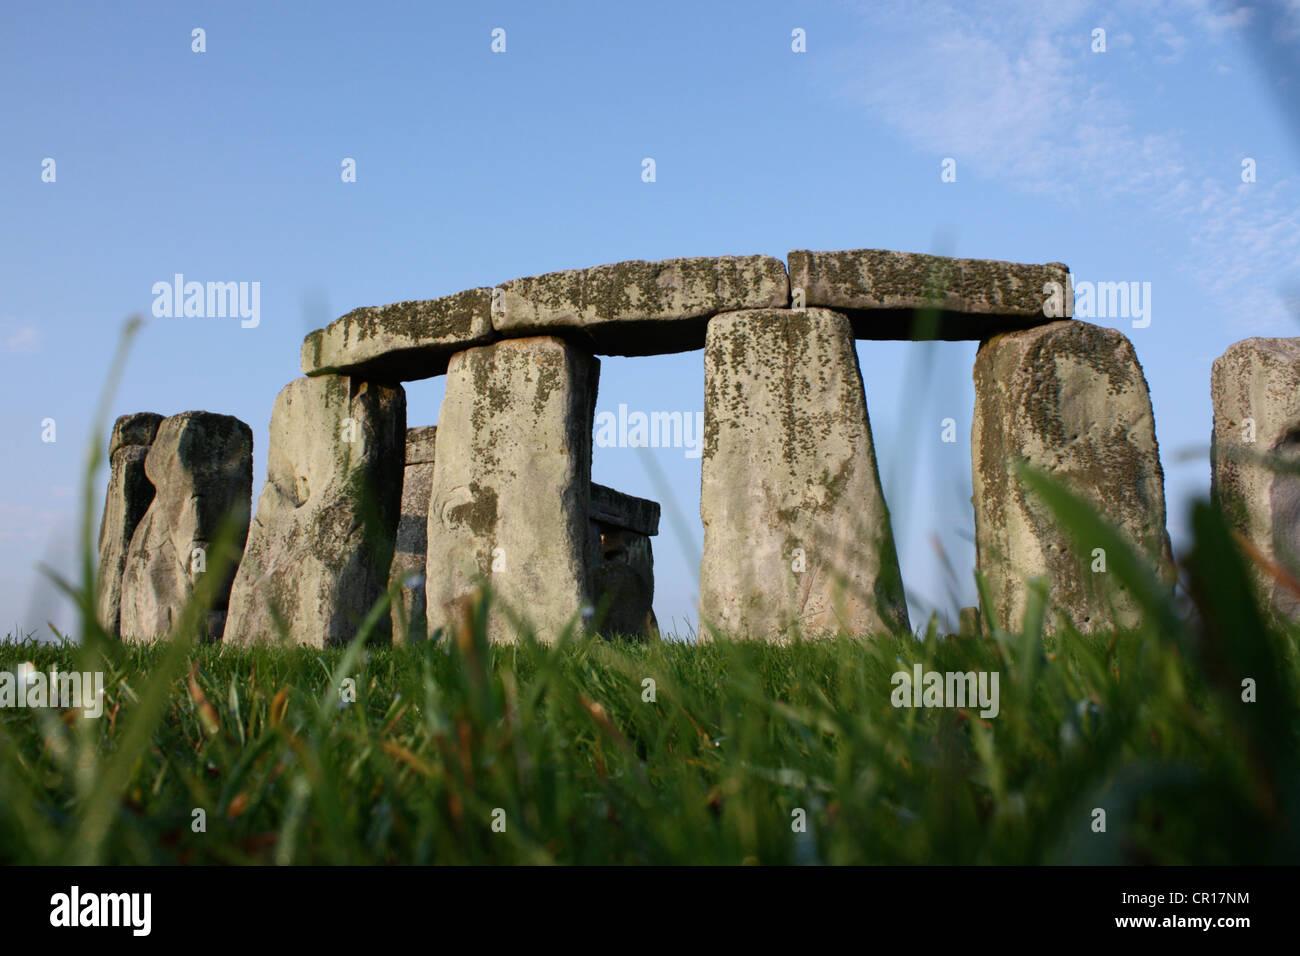 Spring view of the prehistoric landscape Stonehenge - Stock Image